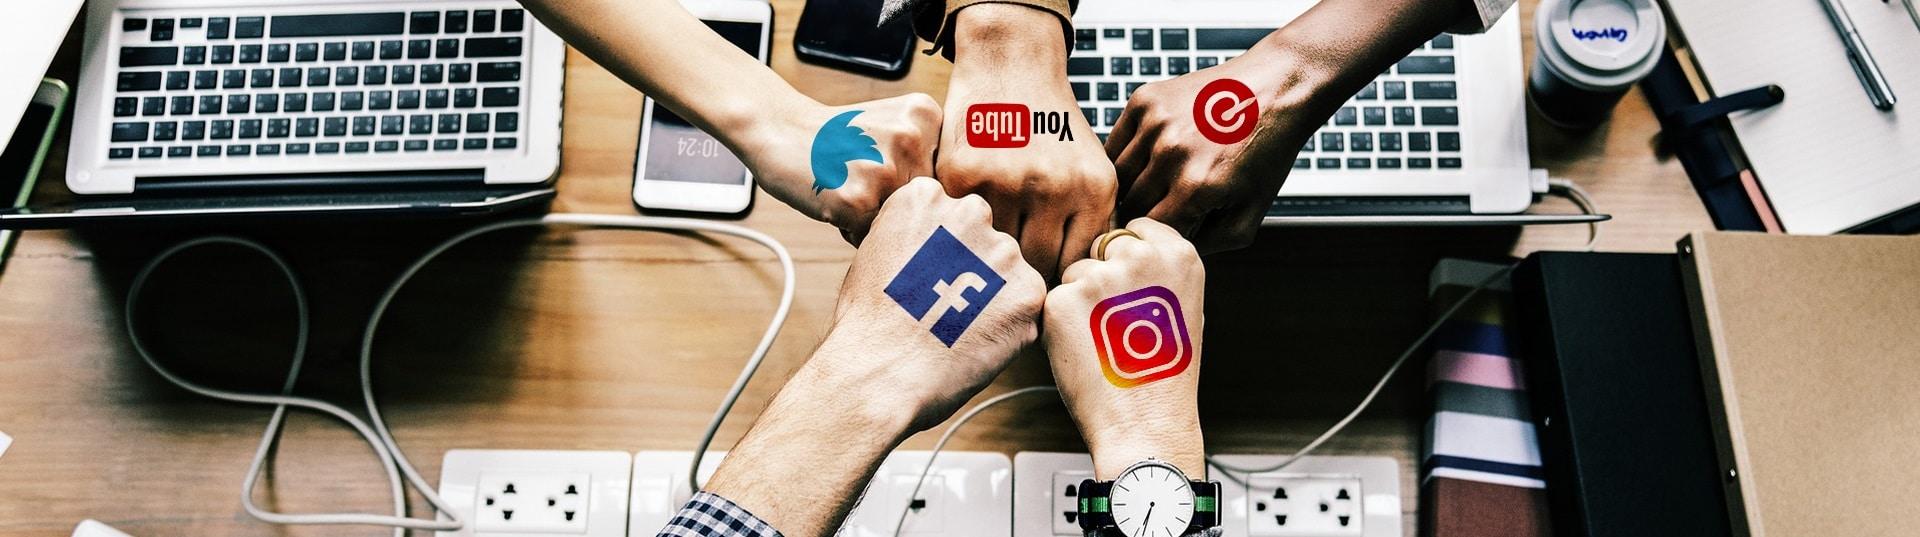 Consultoría Social Media de redes sociales en Mallorca